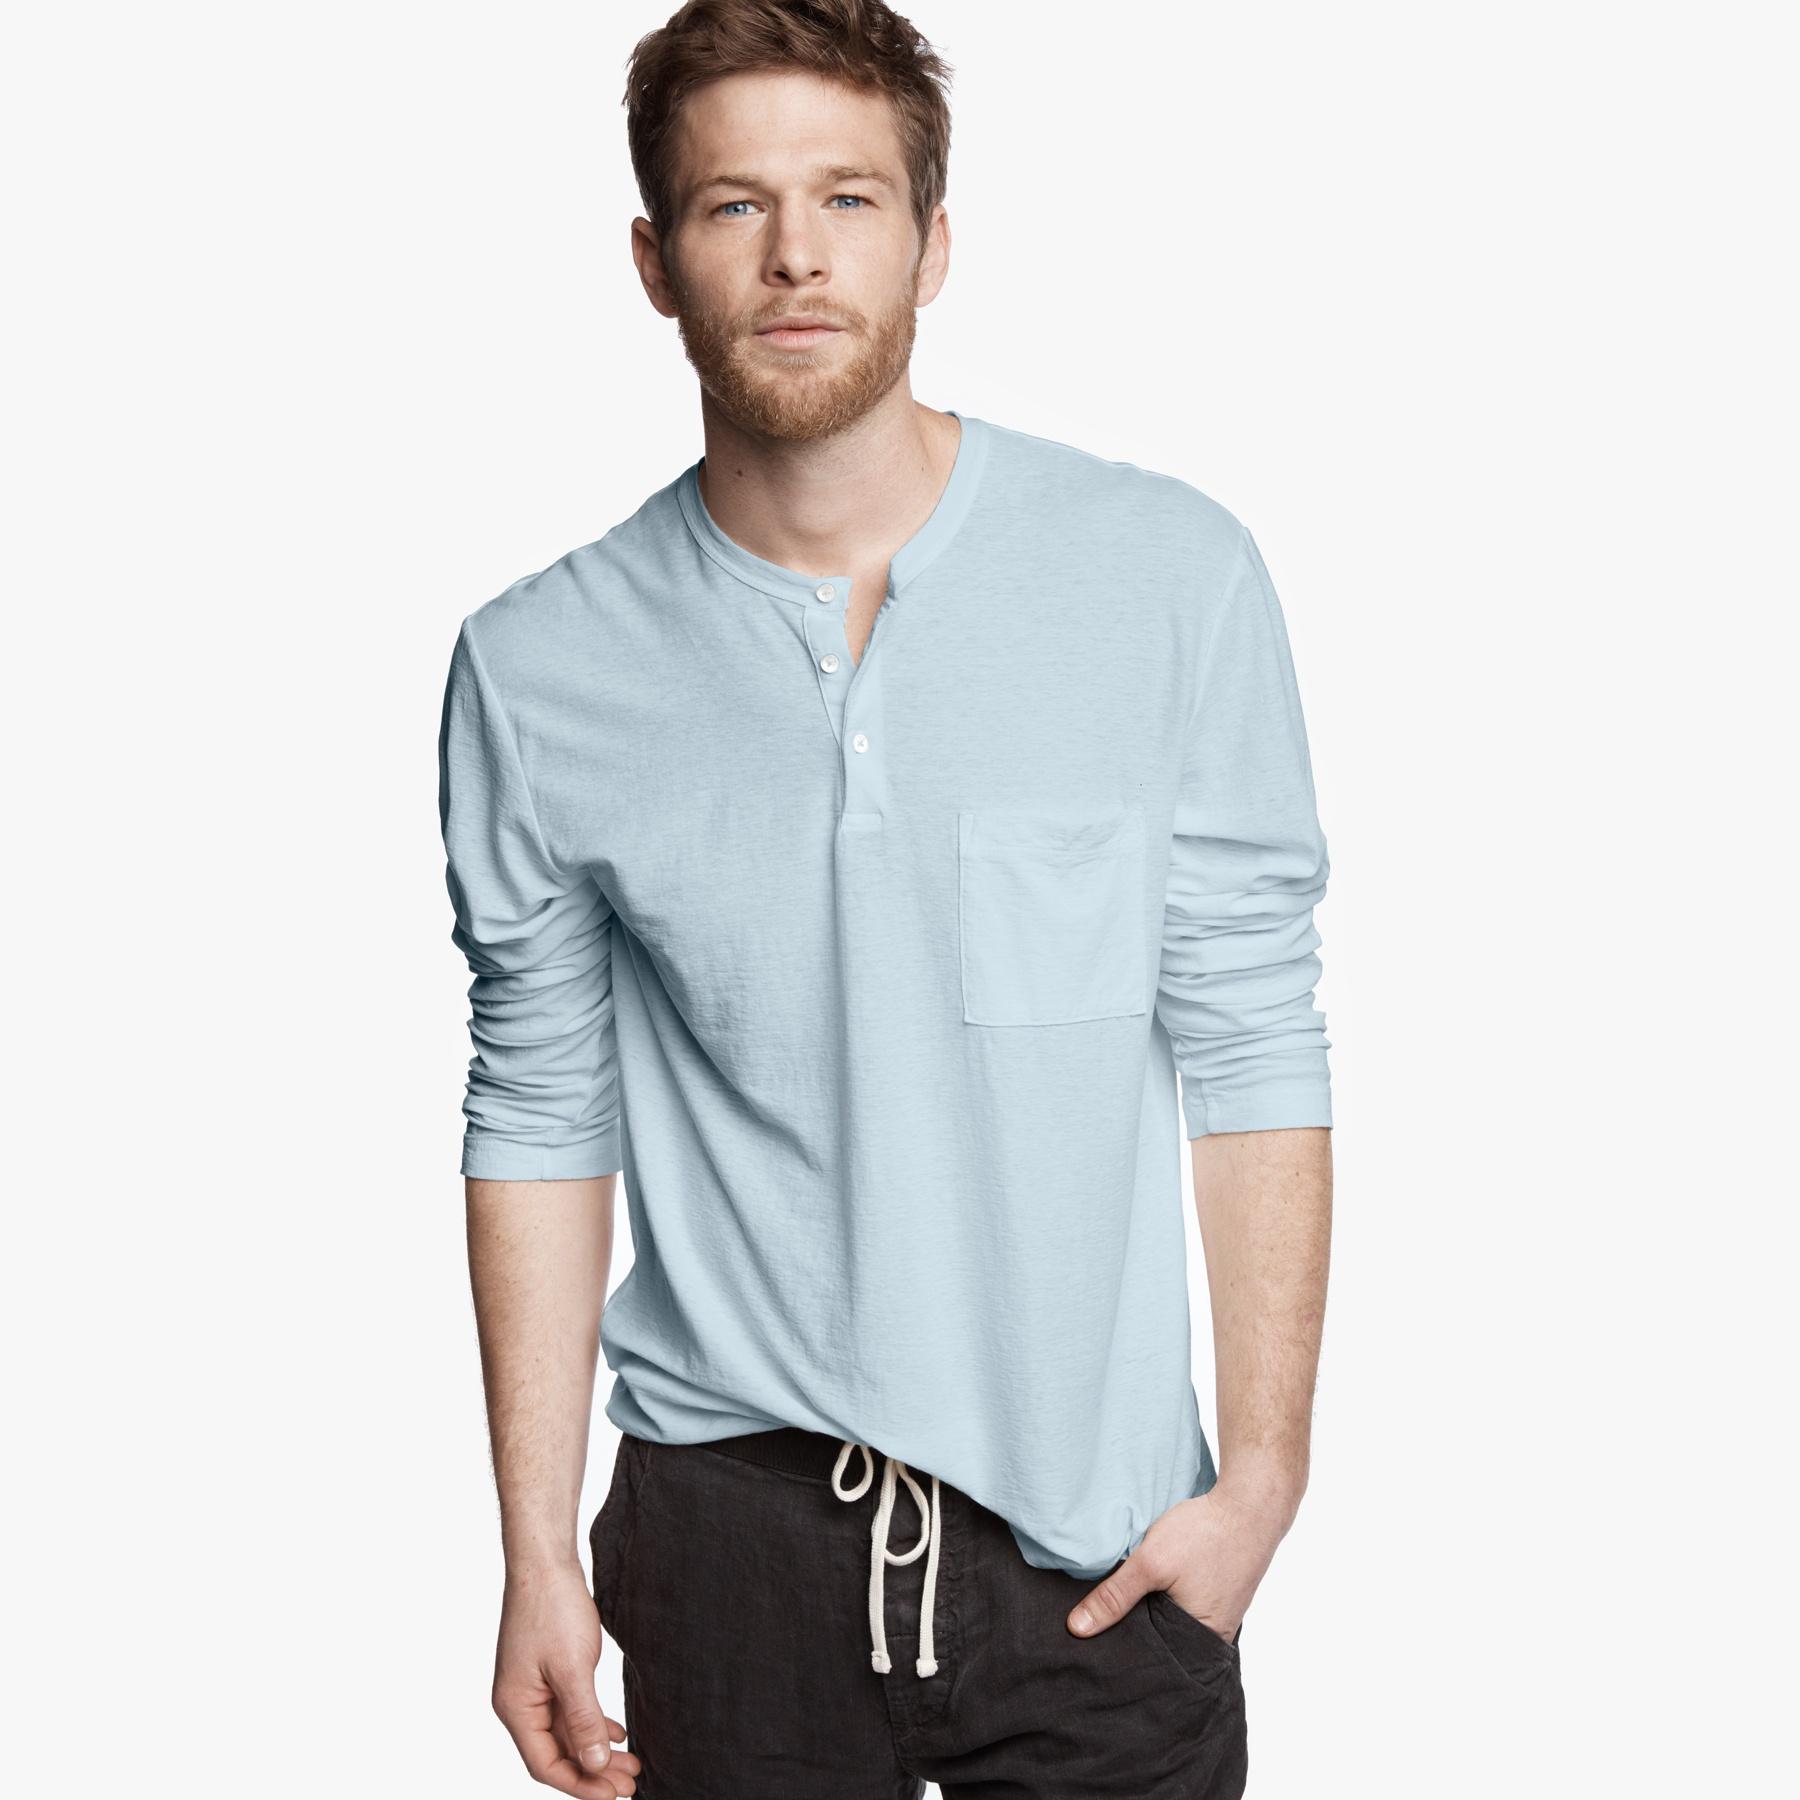 James Perse Cotton Linen Pocket Henley In Blue For Men Lyst